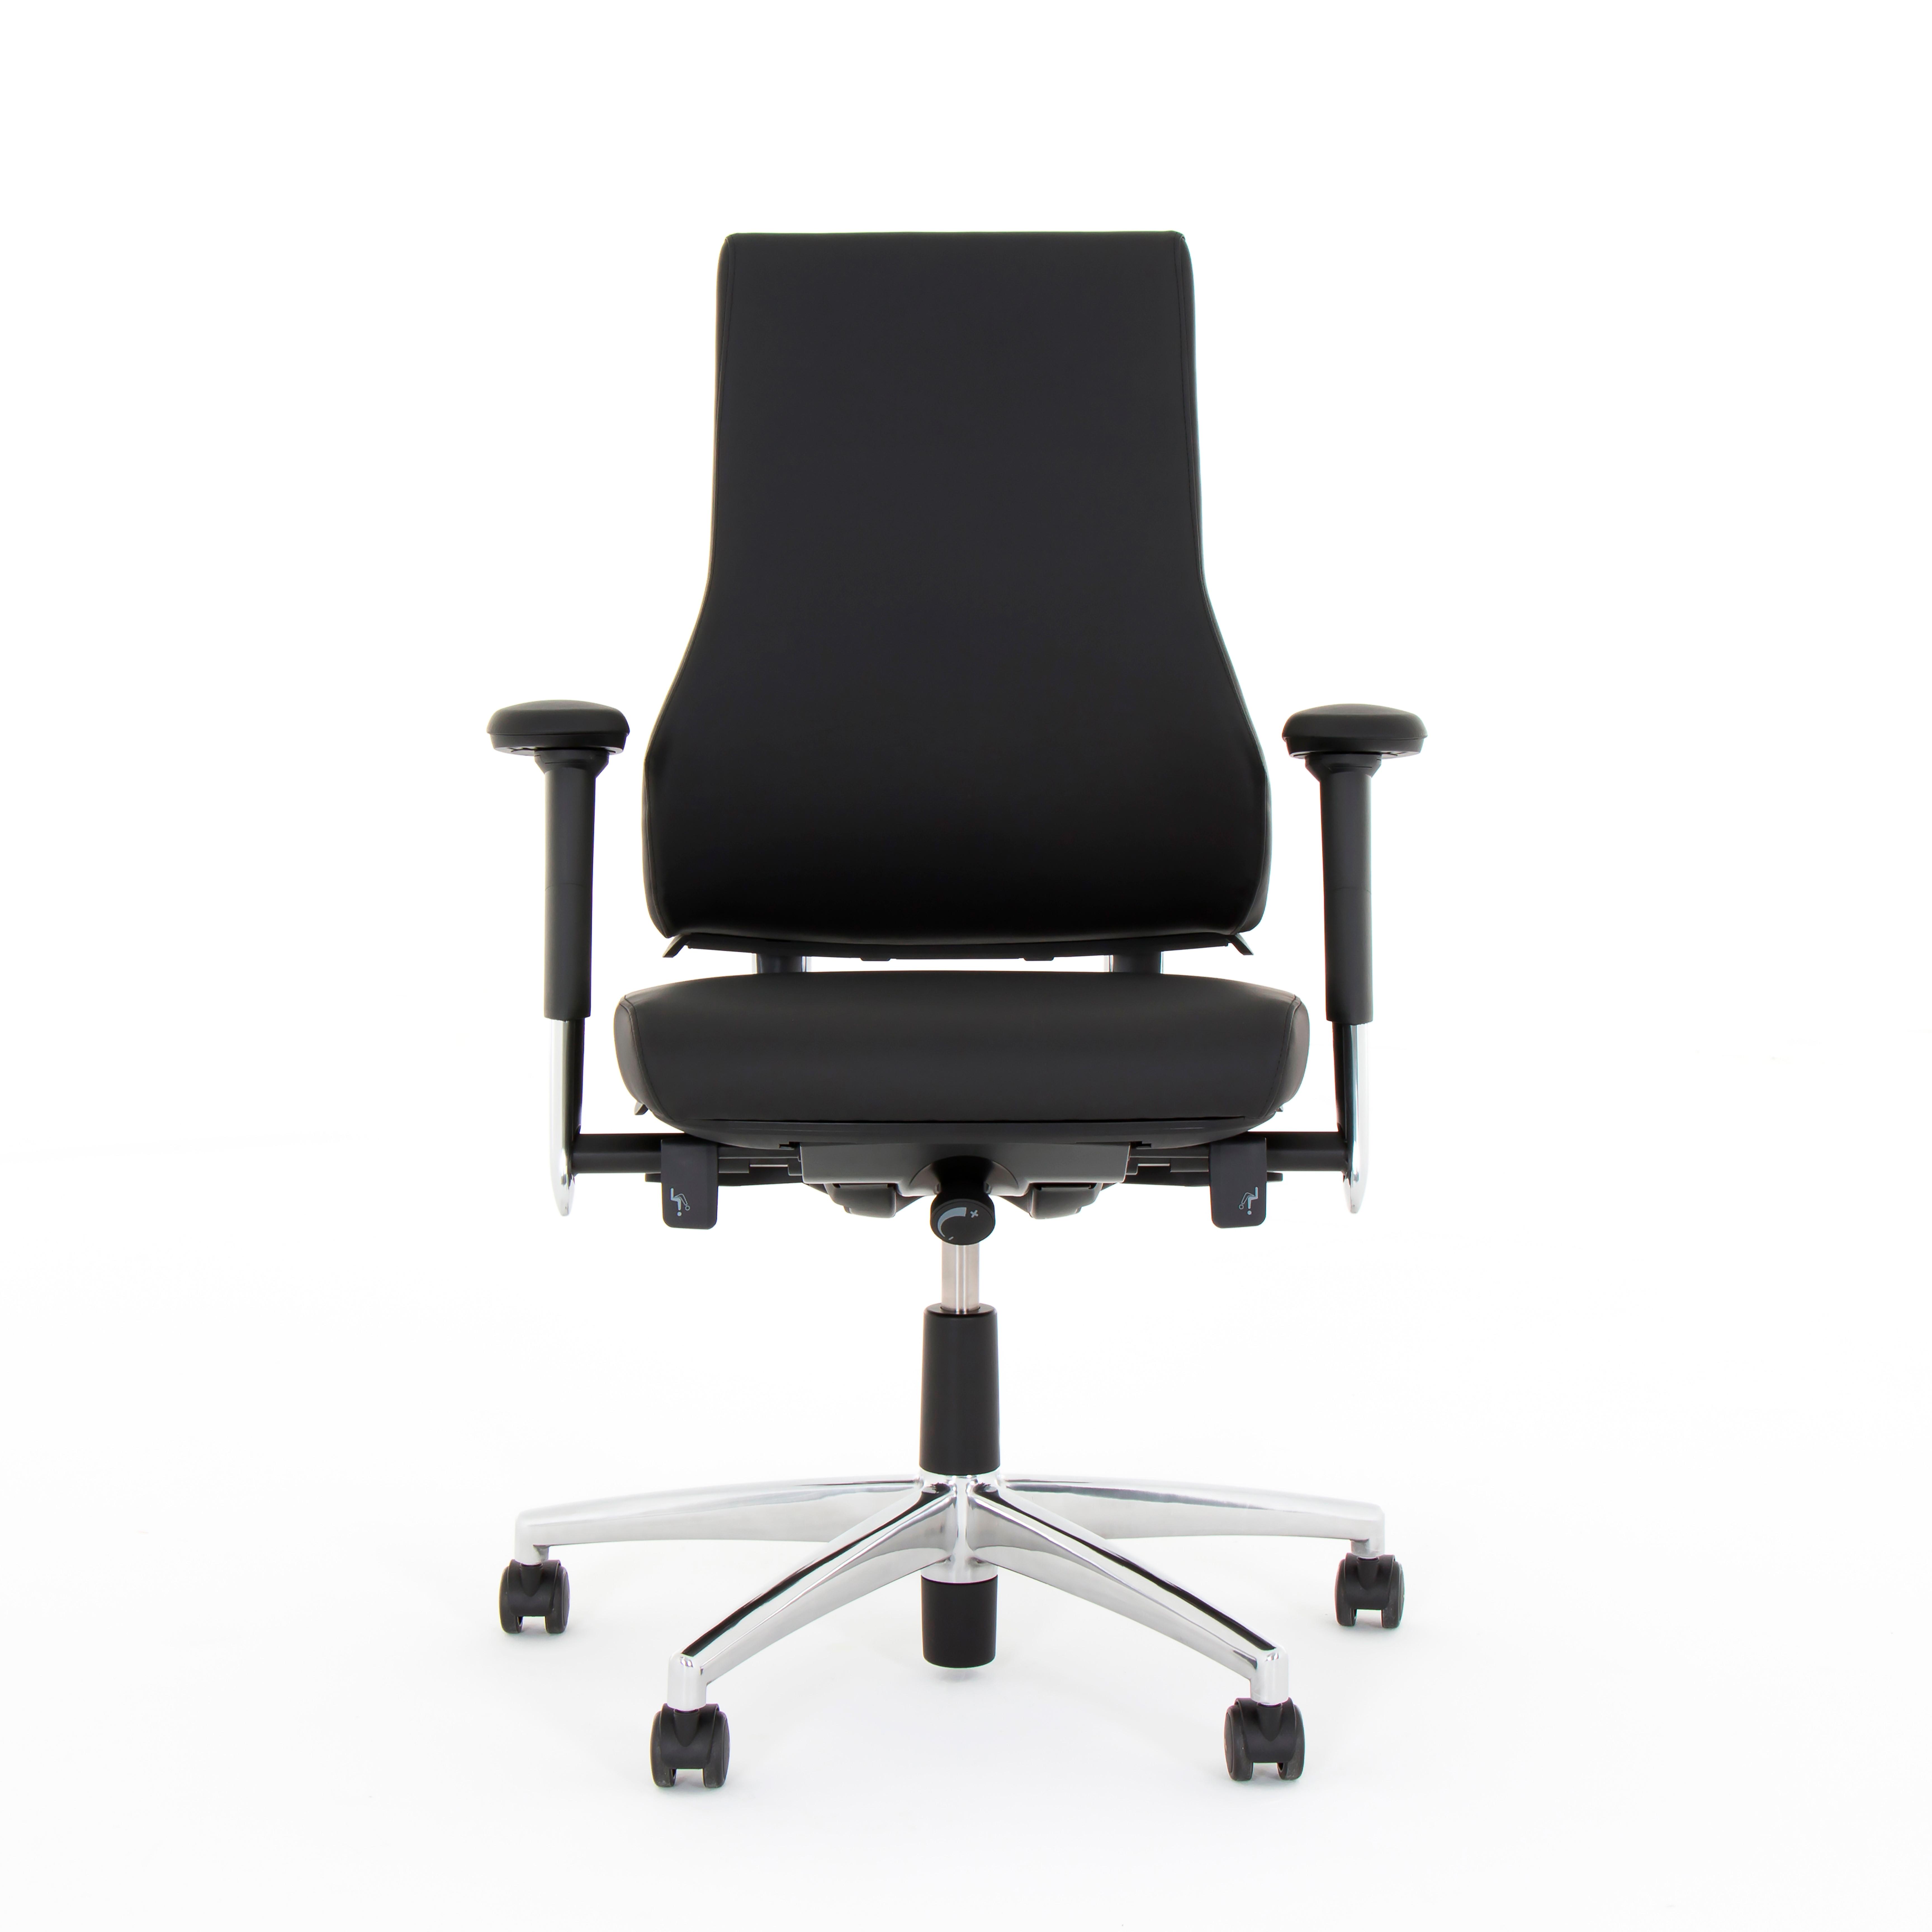 Bürodrehstuhl - AXIA 2.4 schwarz - extra hoher Rücken